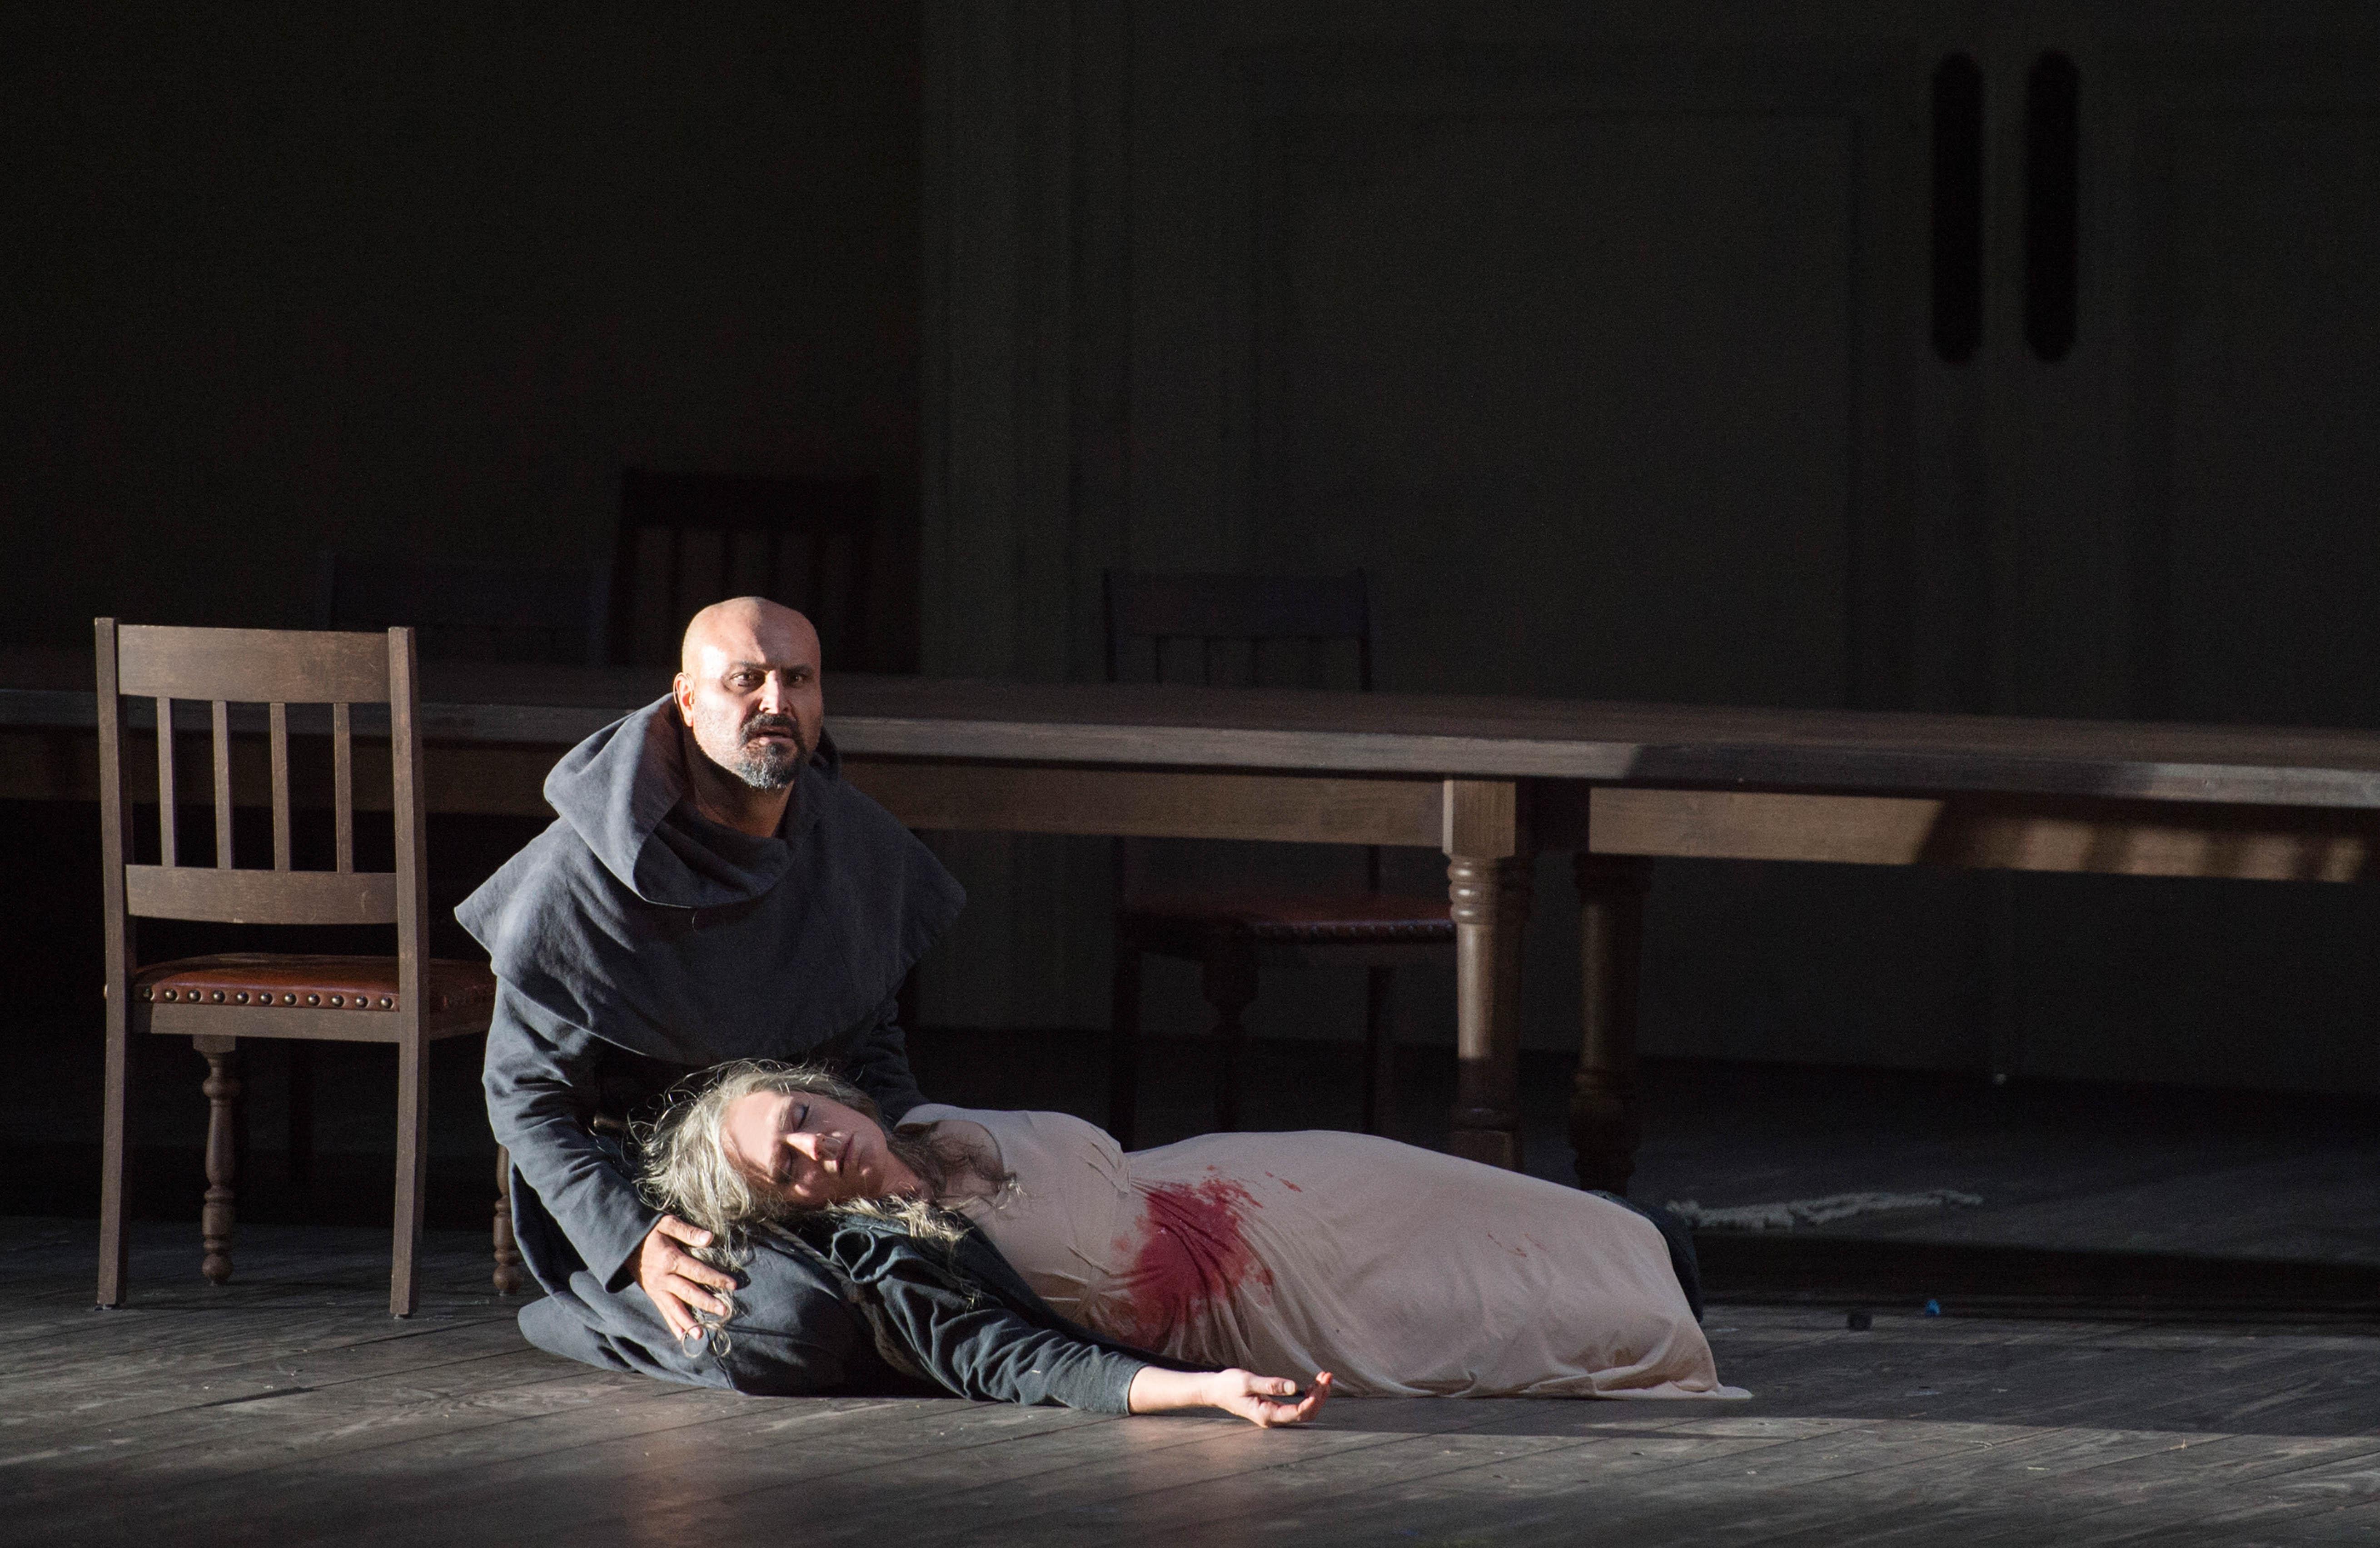 lEonora (Eva-Maria Westbroek) & aLVARO (Roberto Aronica)